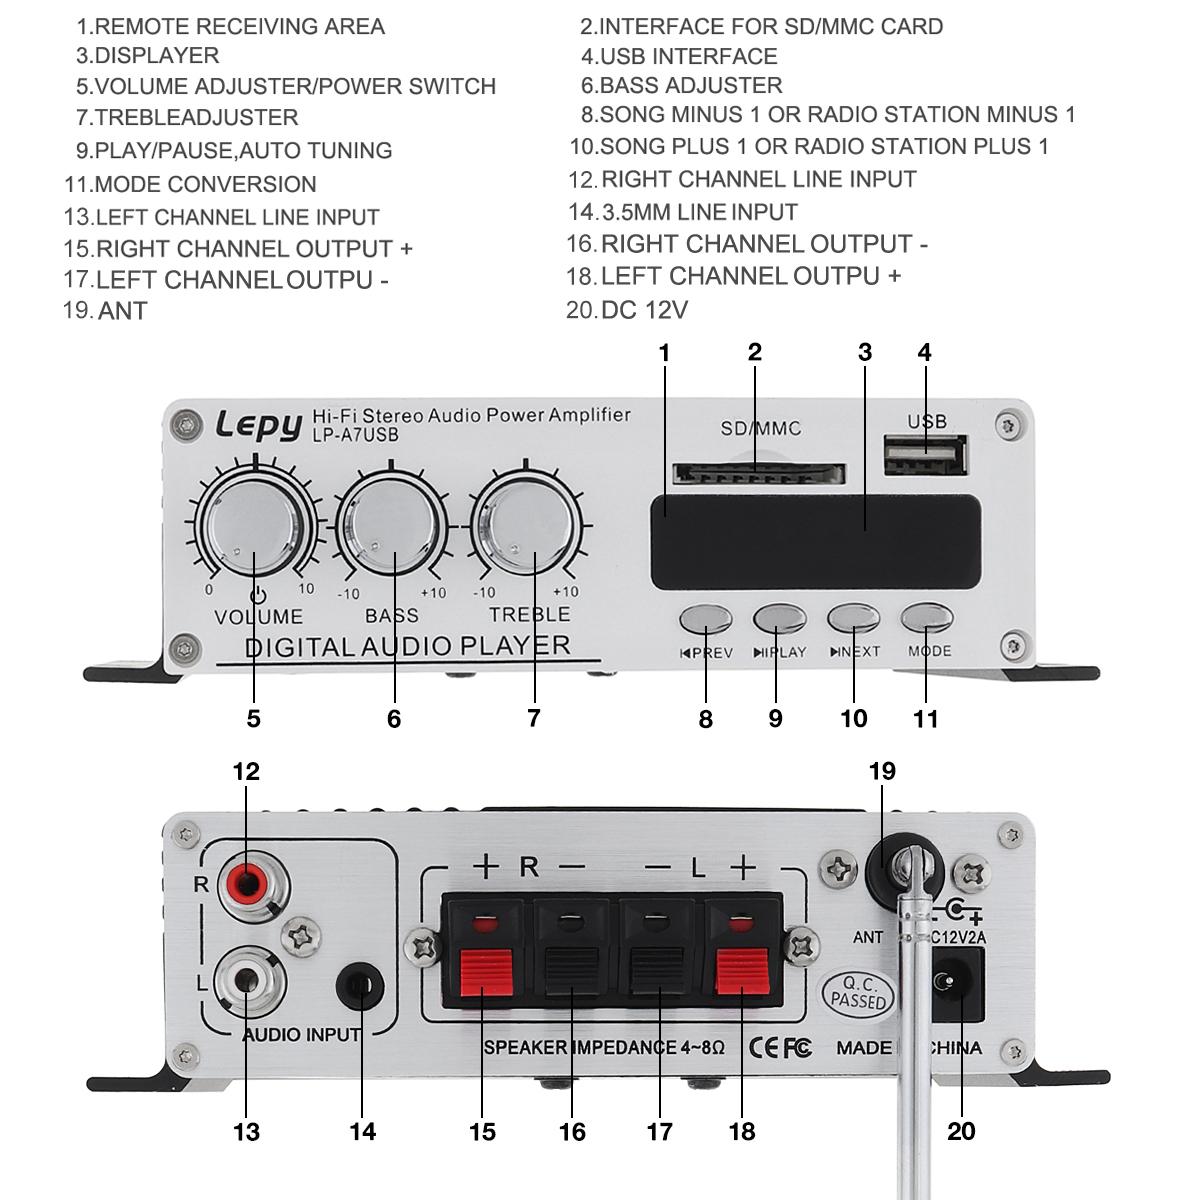 LEPY-Bluetooth-Mini-Power-Audio-Amplifier-Hi-Fi-AMP-MP3-FM-USB-SD-AUX-Car-Home thumbnail 2